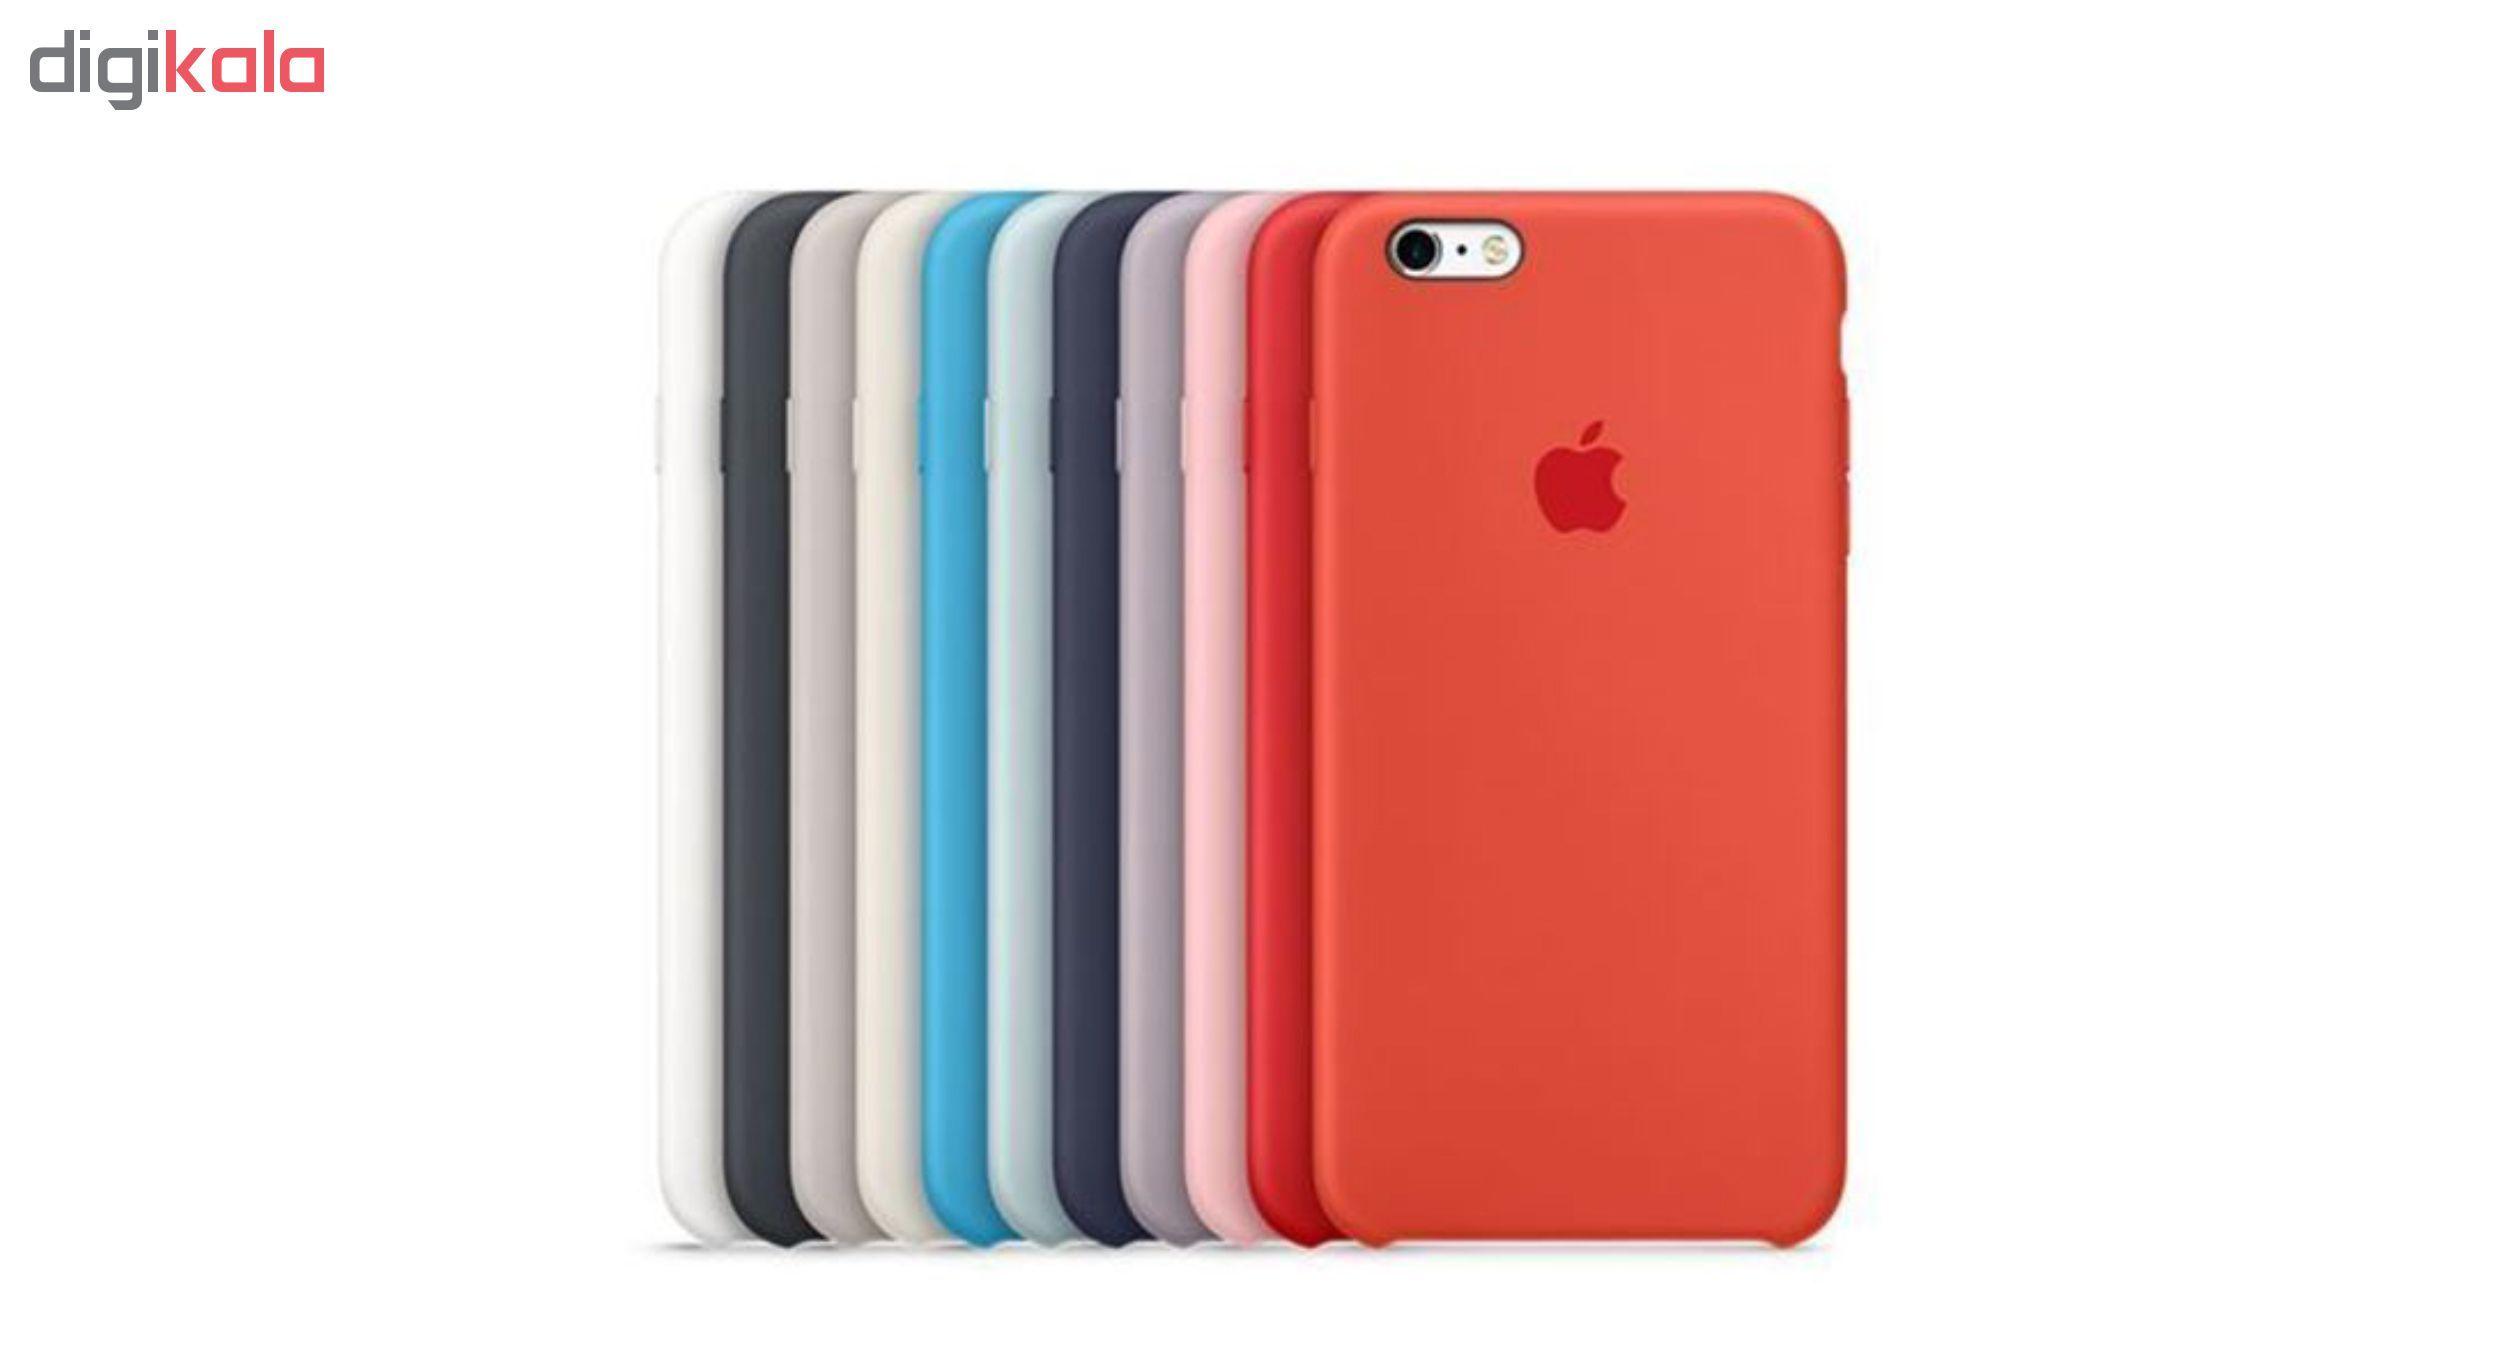 کاور سومگ مدل SIC مناسب برای گوشی موبایل اپل iPhone 6/6s main 1 6